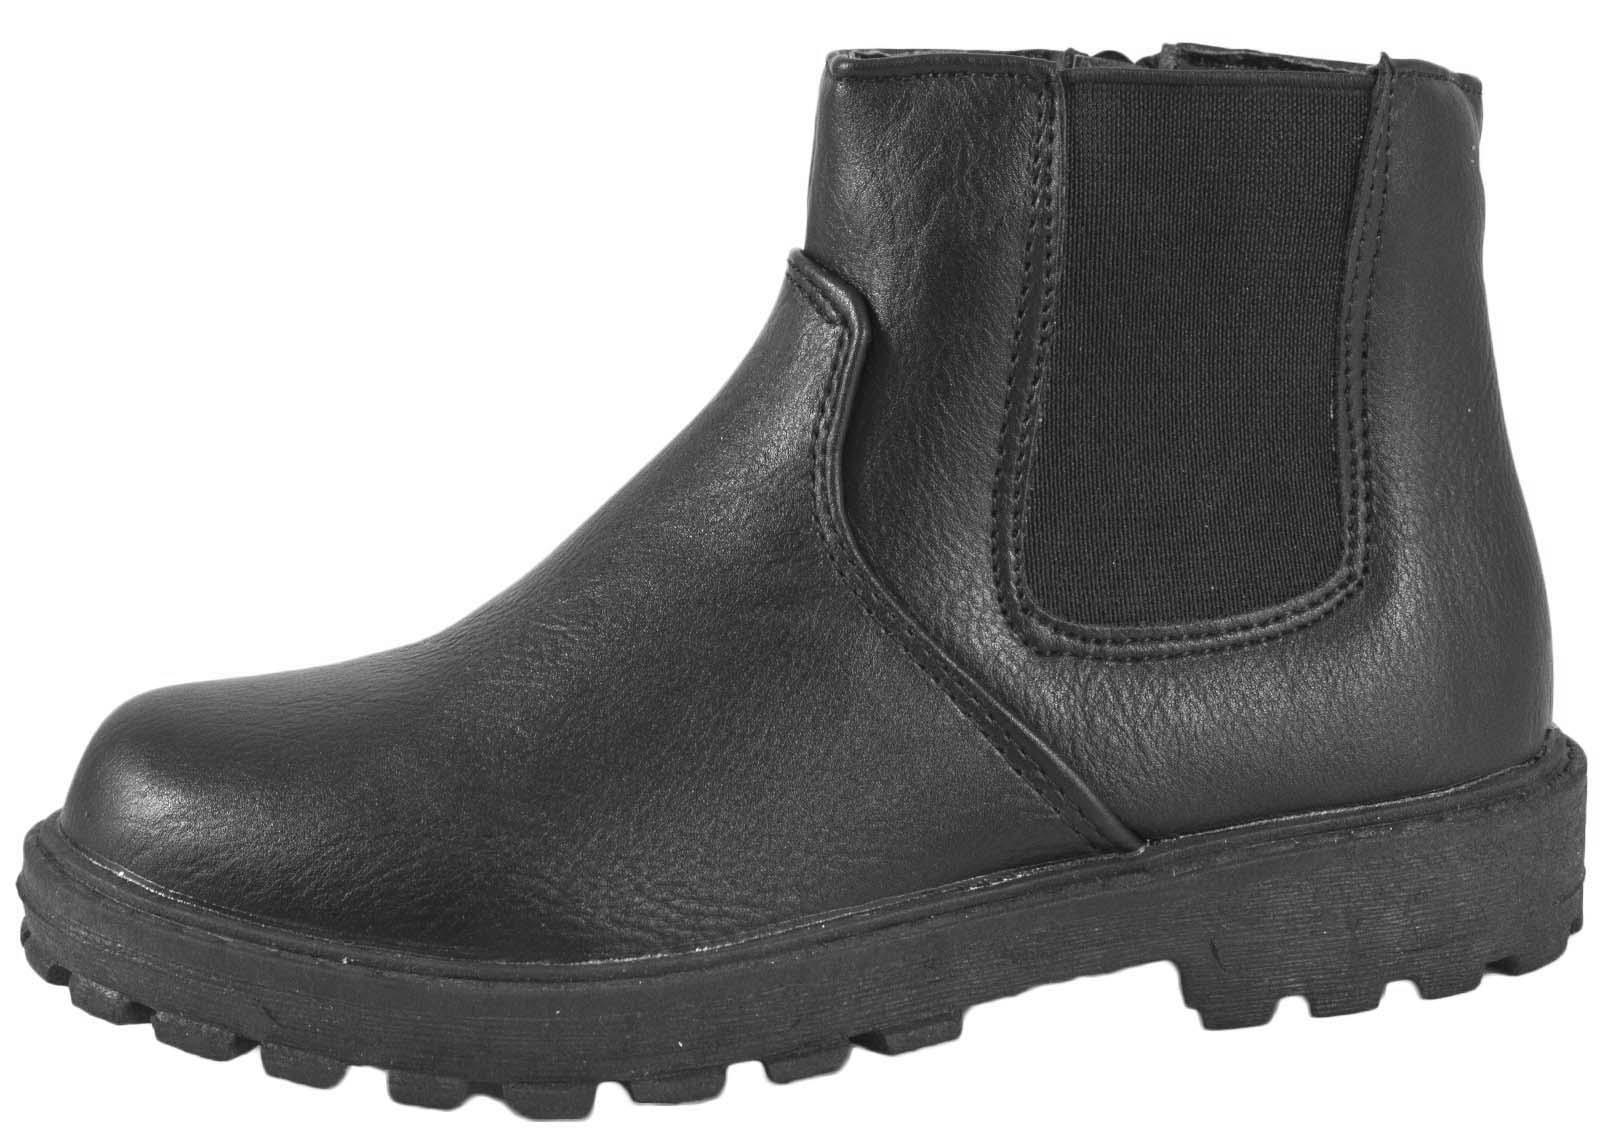 boys black school shoes faux leather chelsea ankle boots